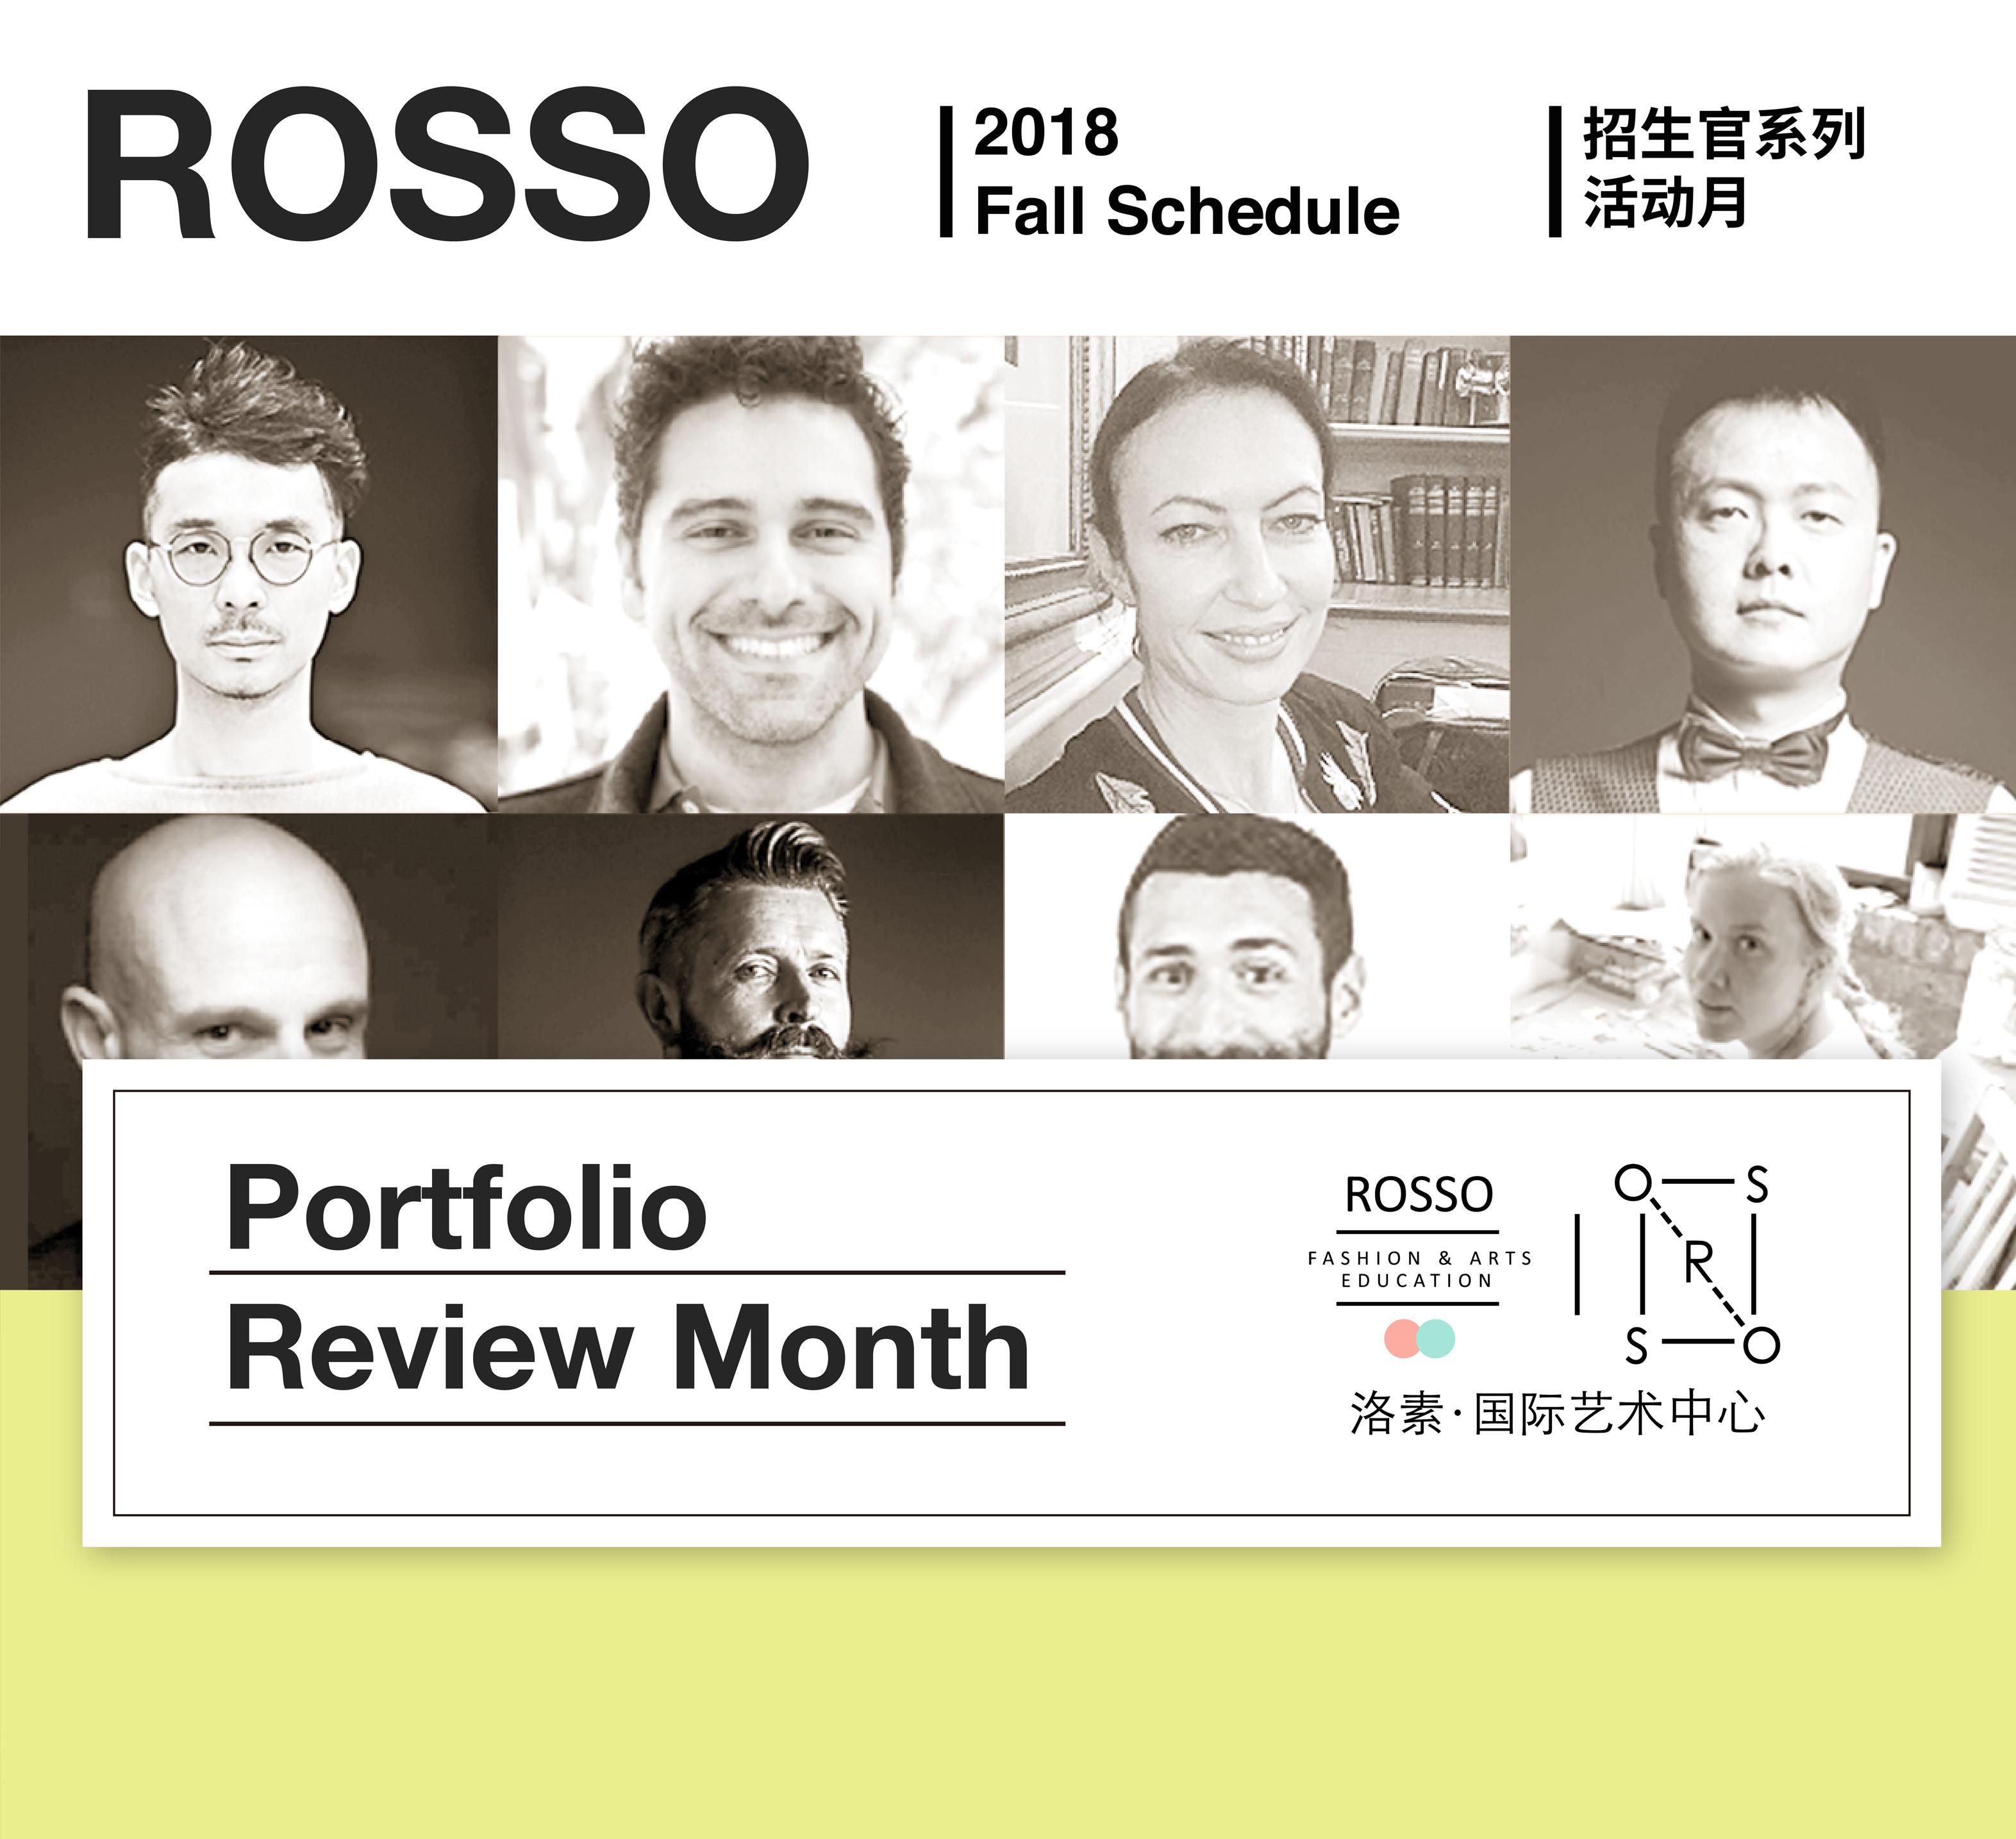 ROSSO国际艺术教育招生官活动.jpg